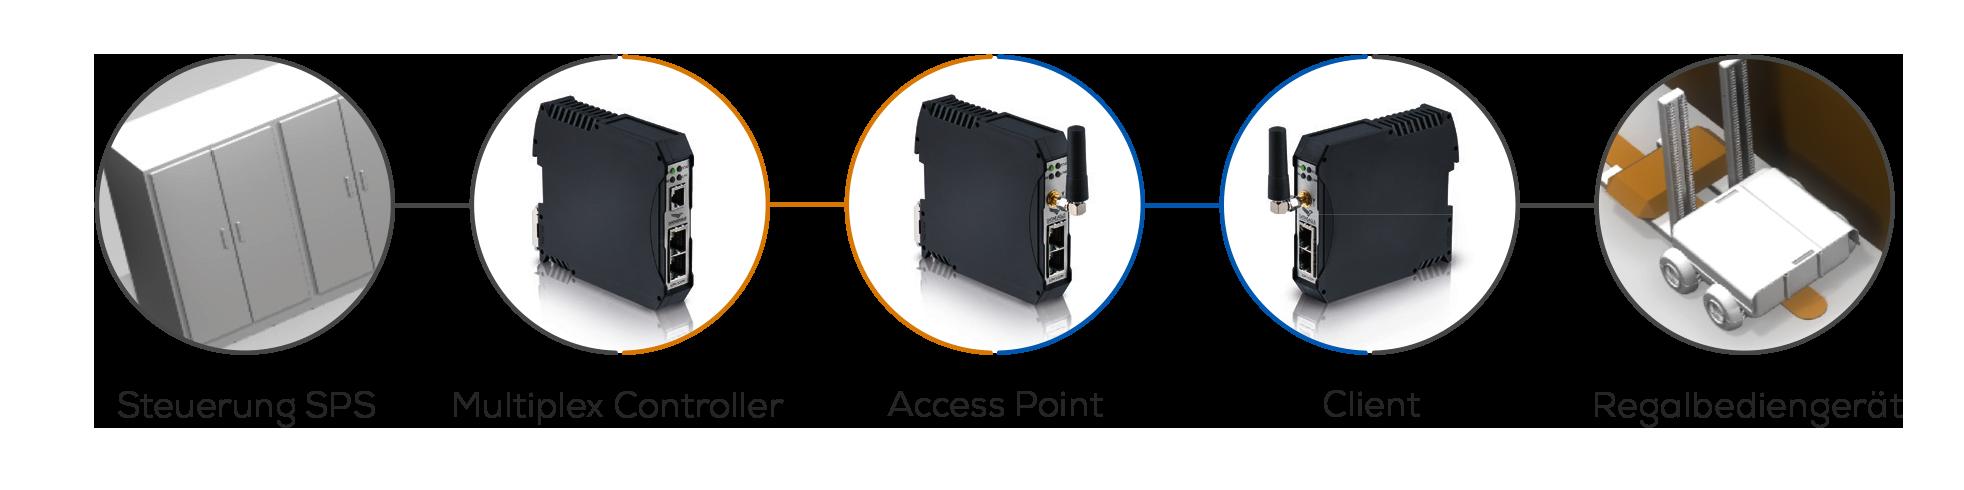 Schildknecht AG enables Bluetooth seamless roaming